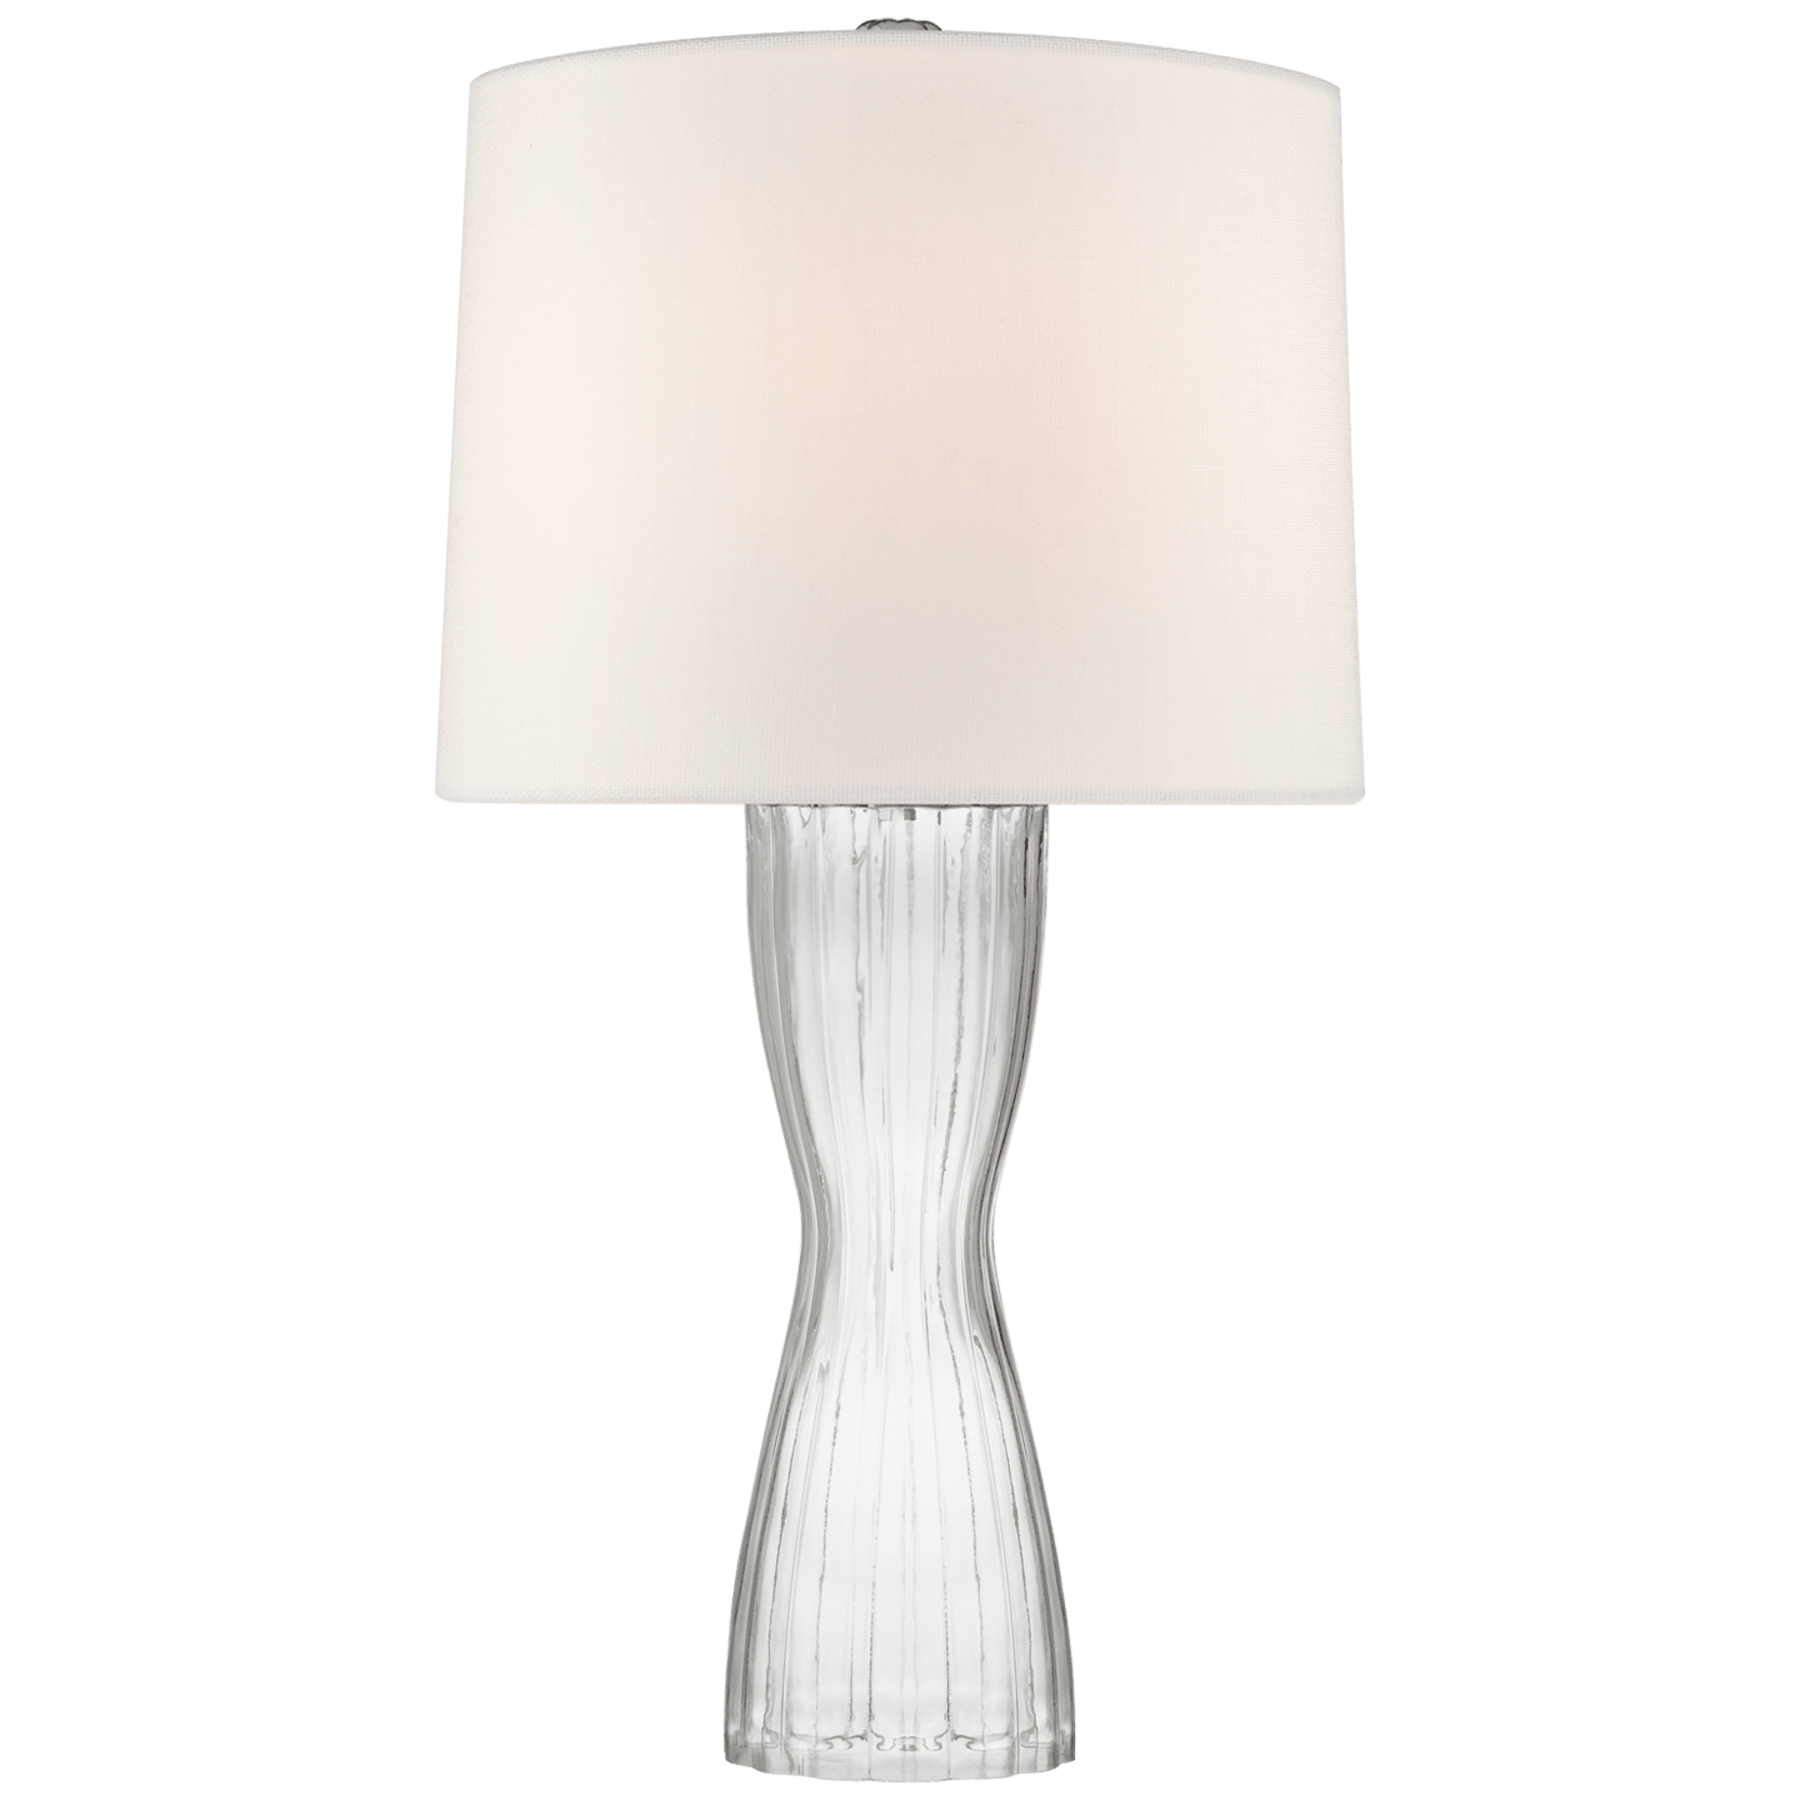 Seine Medium Table Lamp In 2020 Lamp Table Lamp Media Table